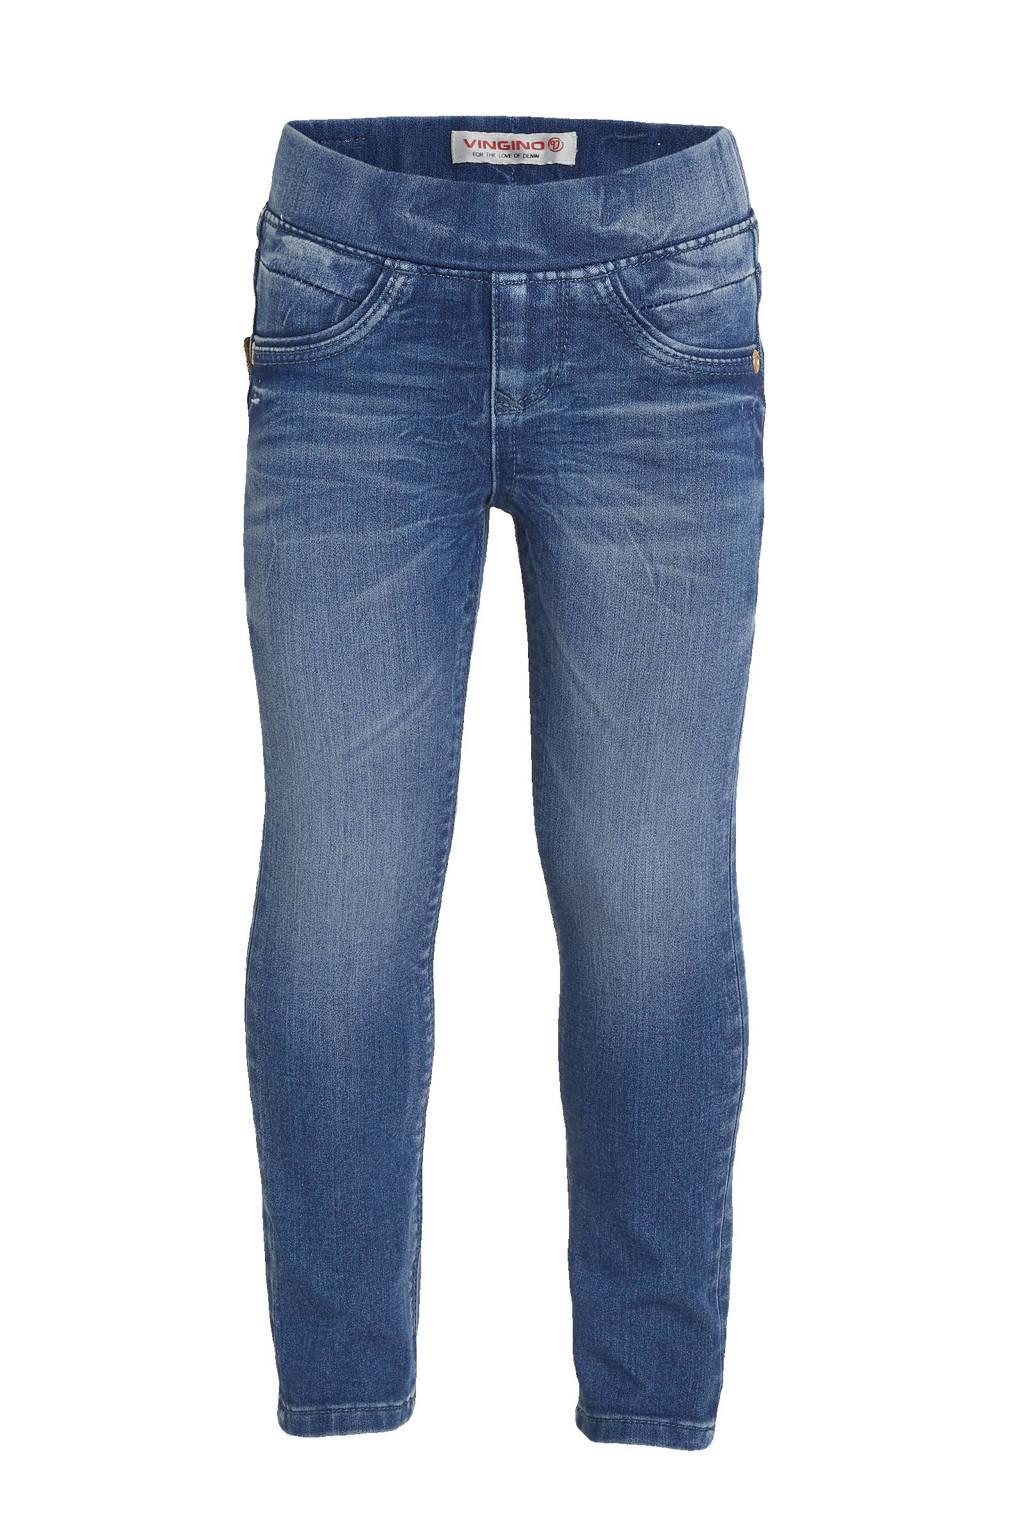 Vingino regular fit jeans Beth mini electric blue, Electric blue